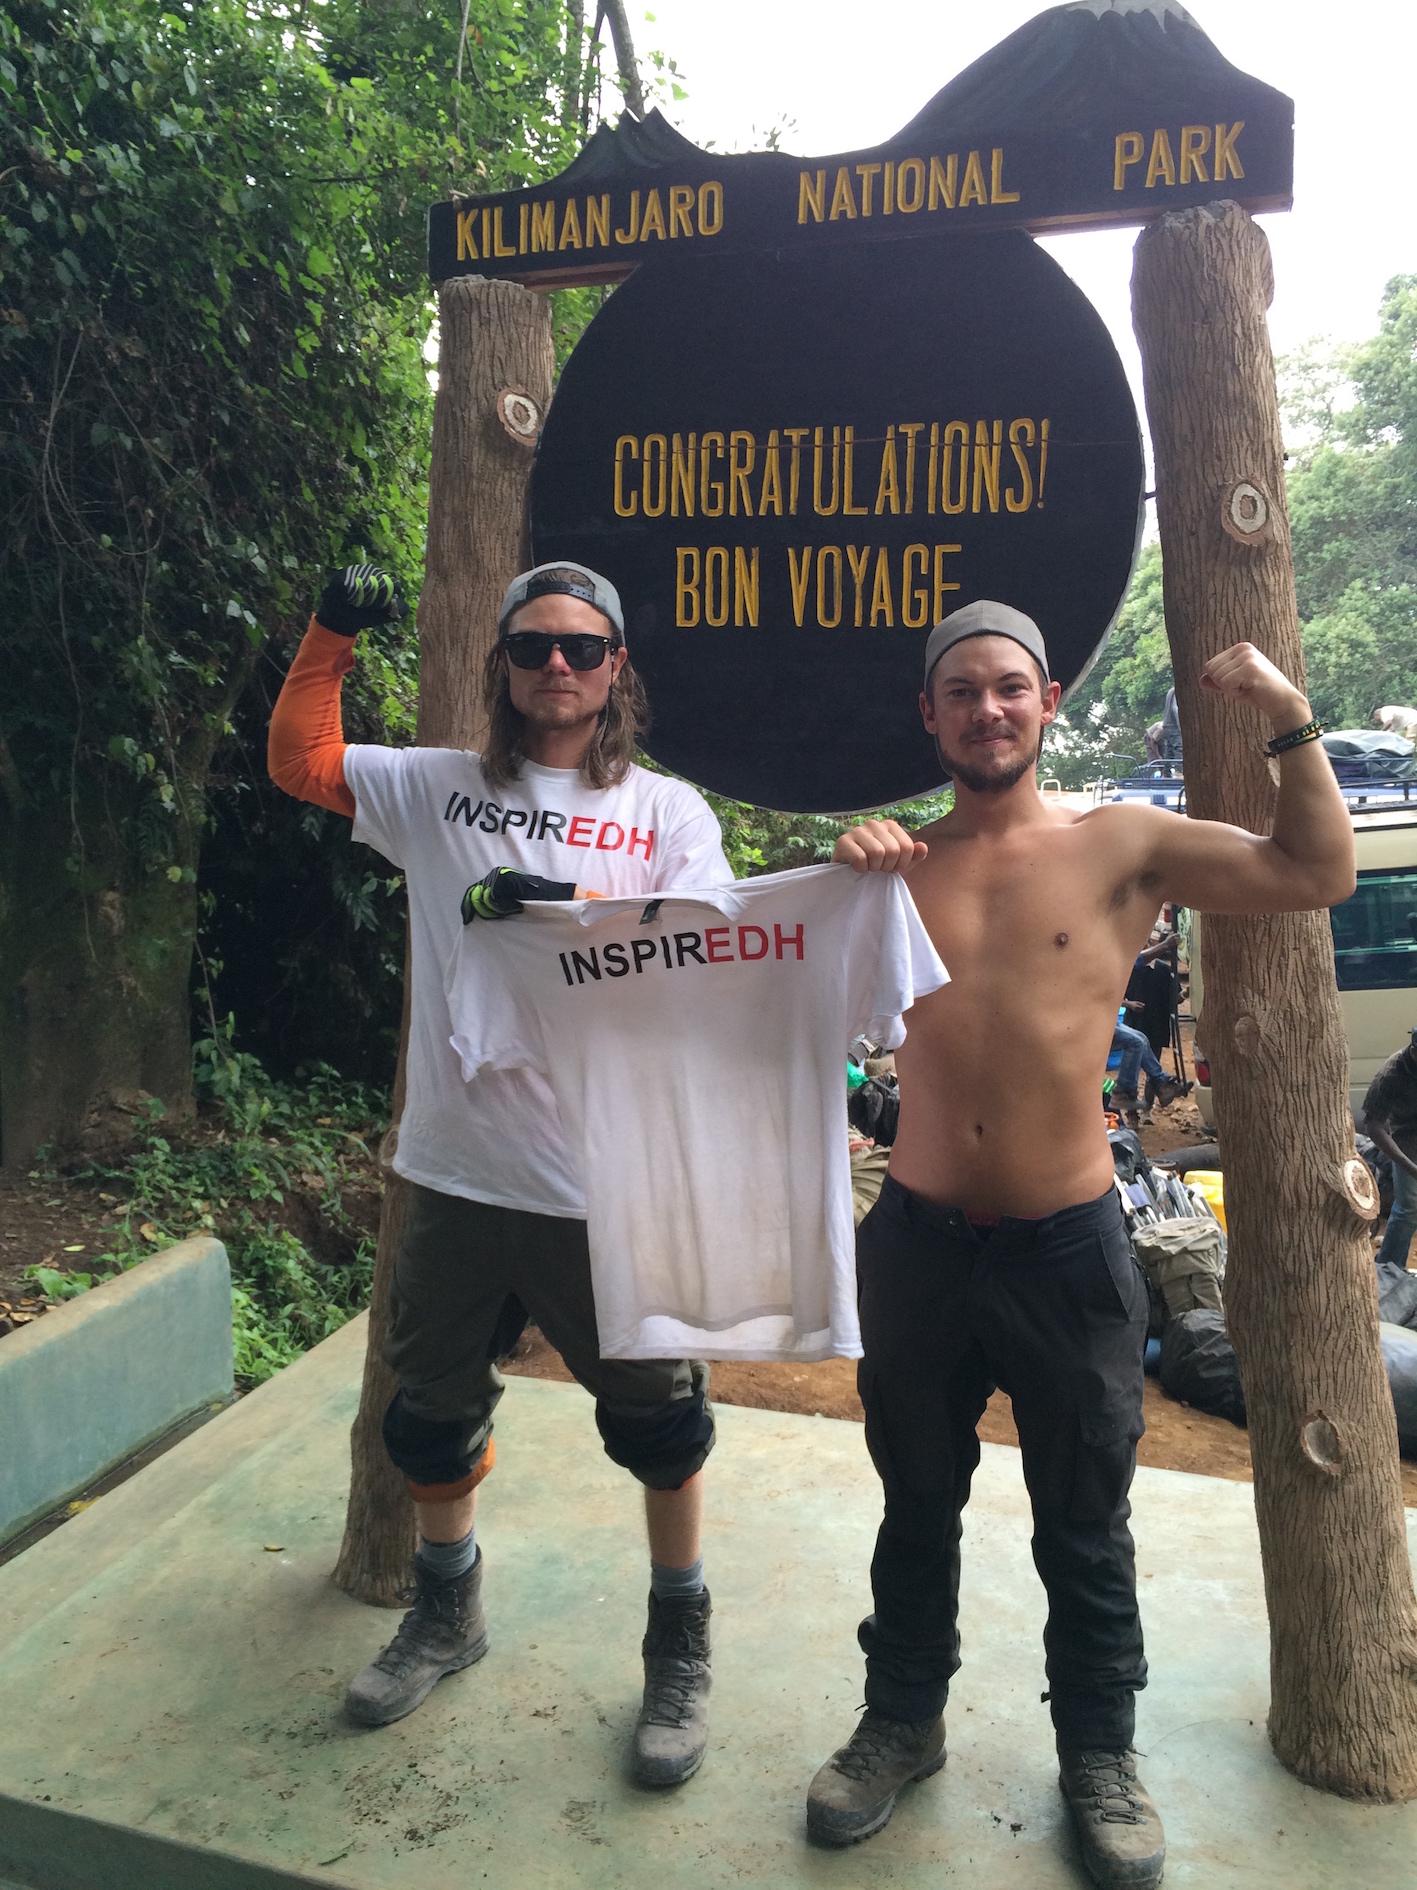 kilimanjaro-jag-och-brorsan-fredrik-edh-firar